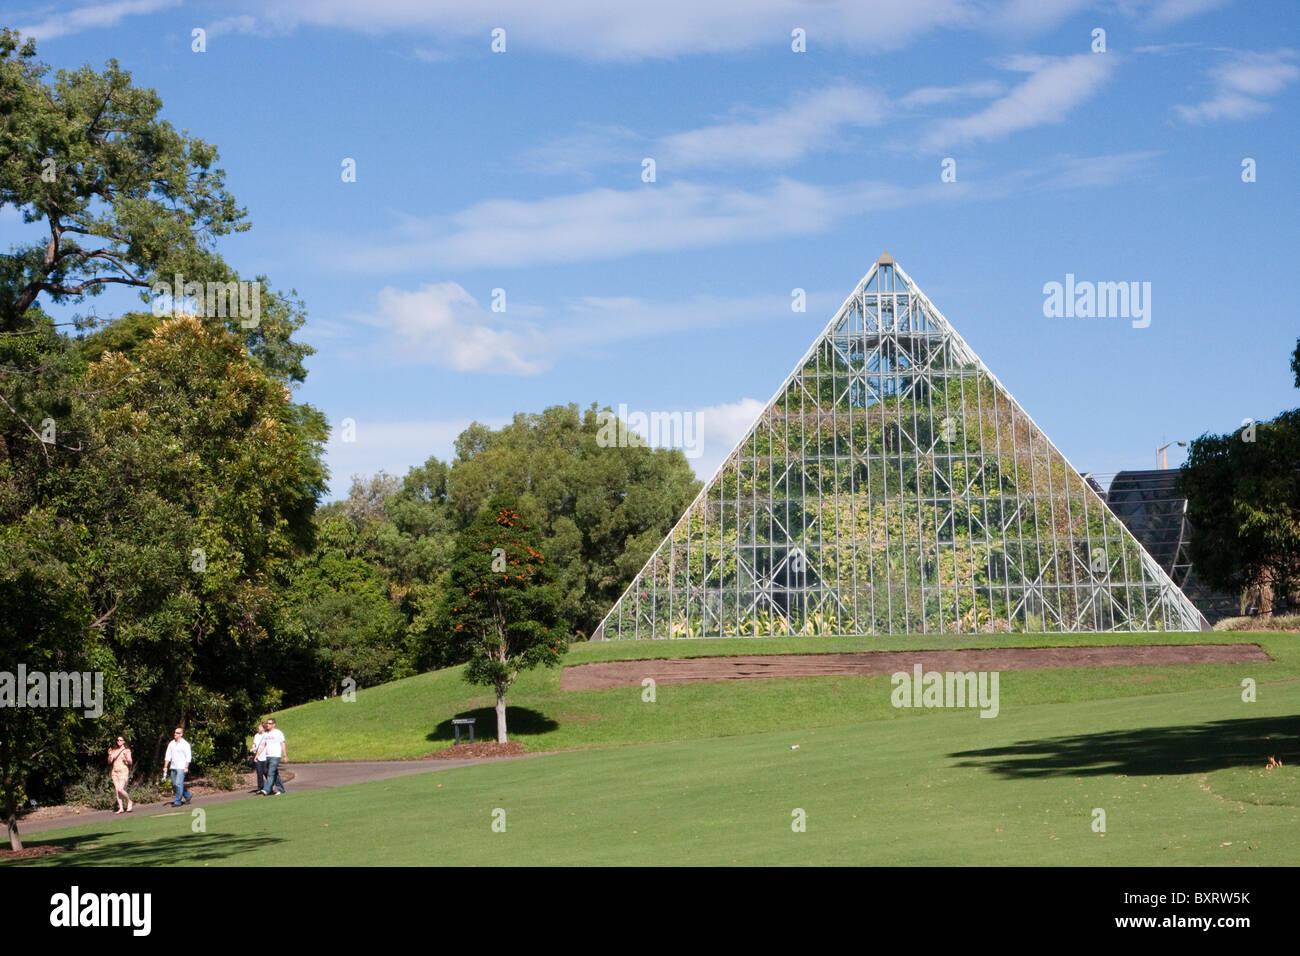 Australia New South Wales Sydney Royal Botanic Gardens People Stock Photo Royalty Free